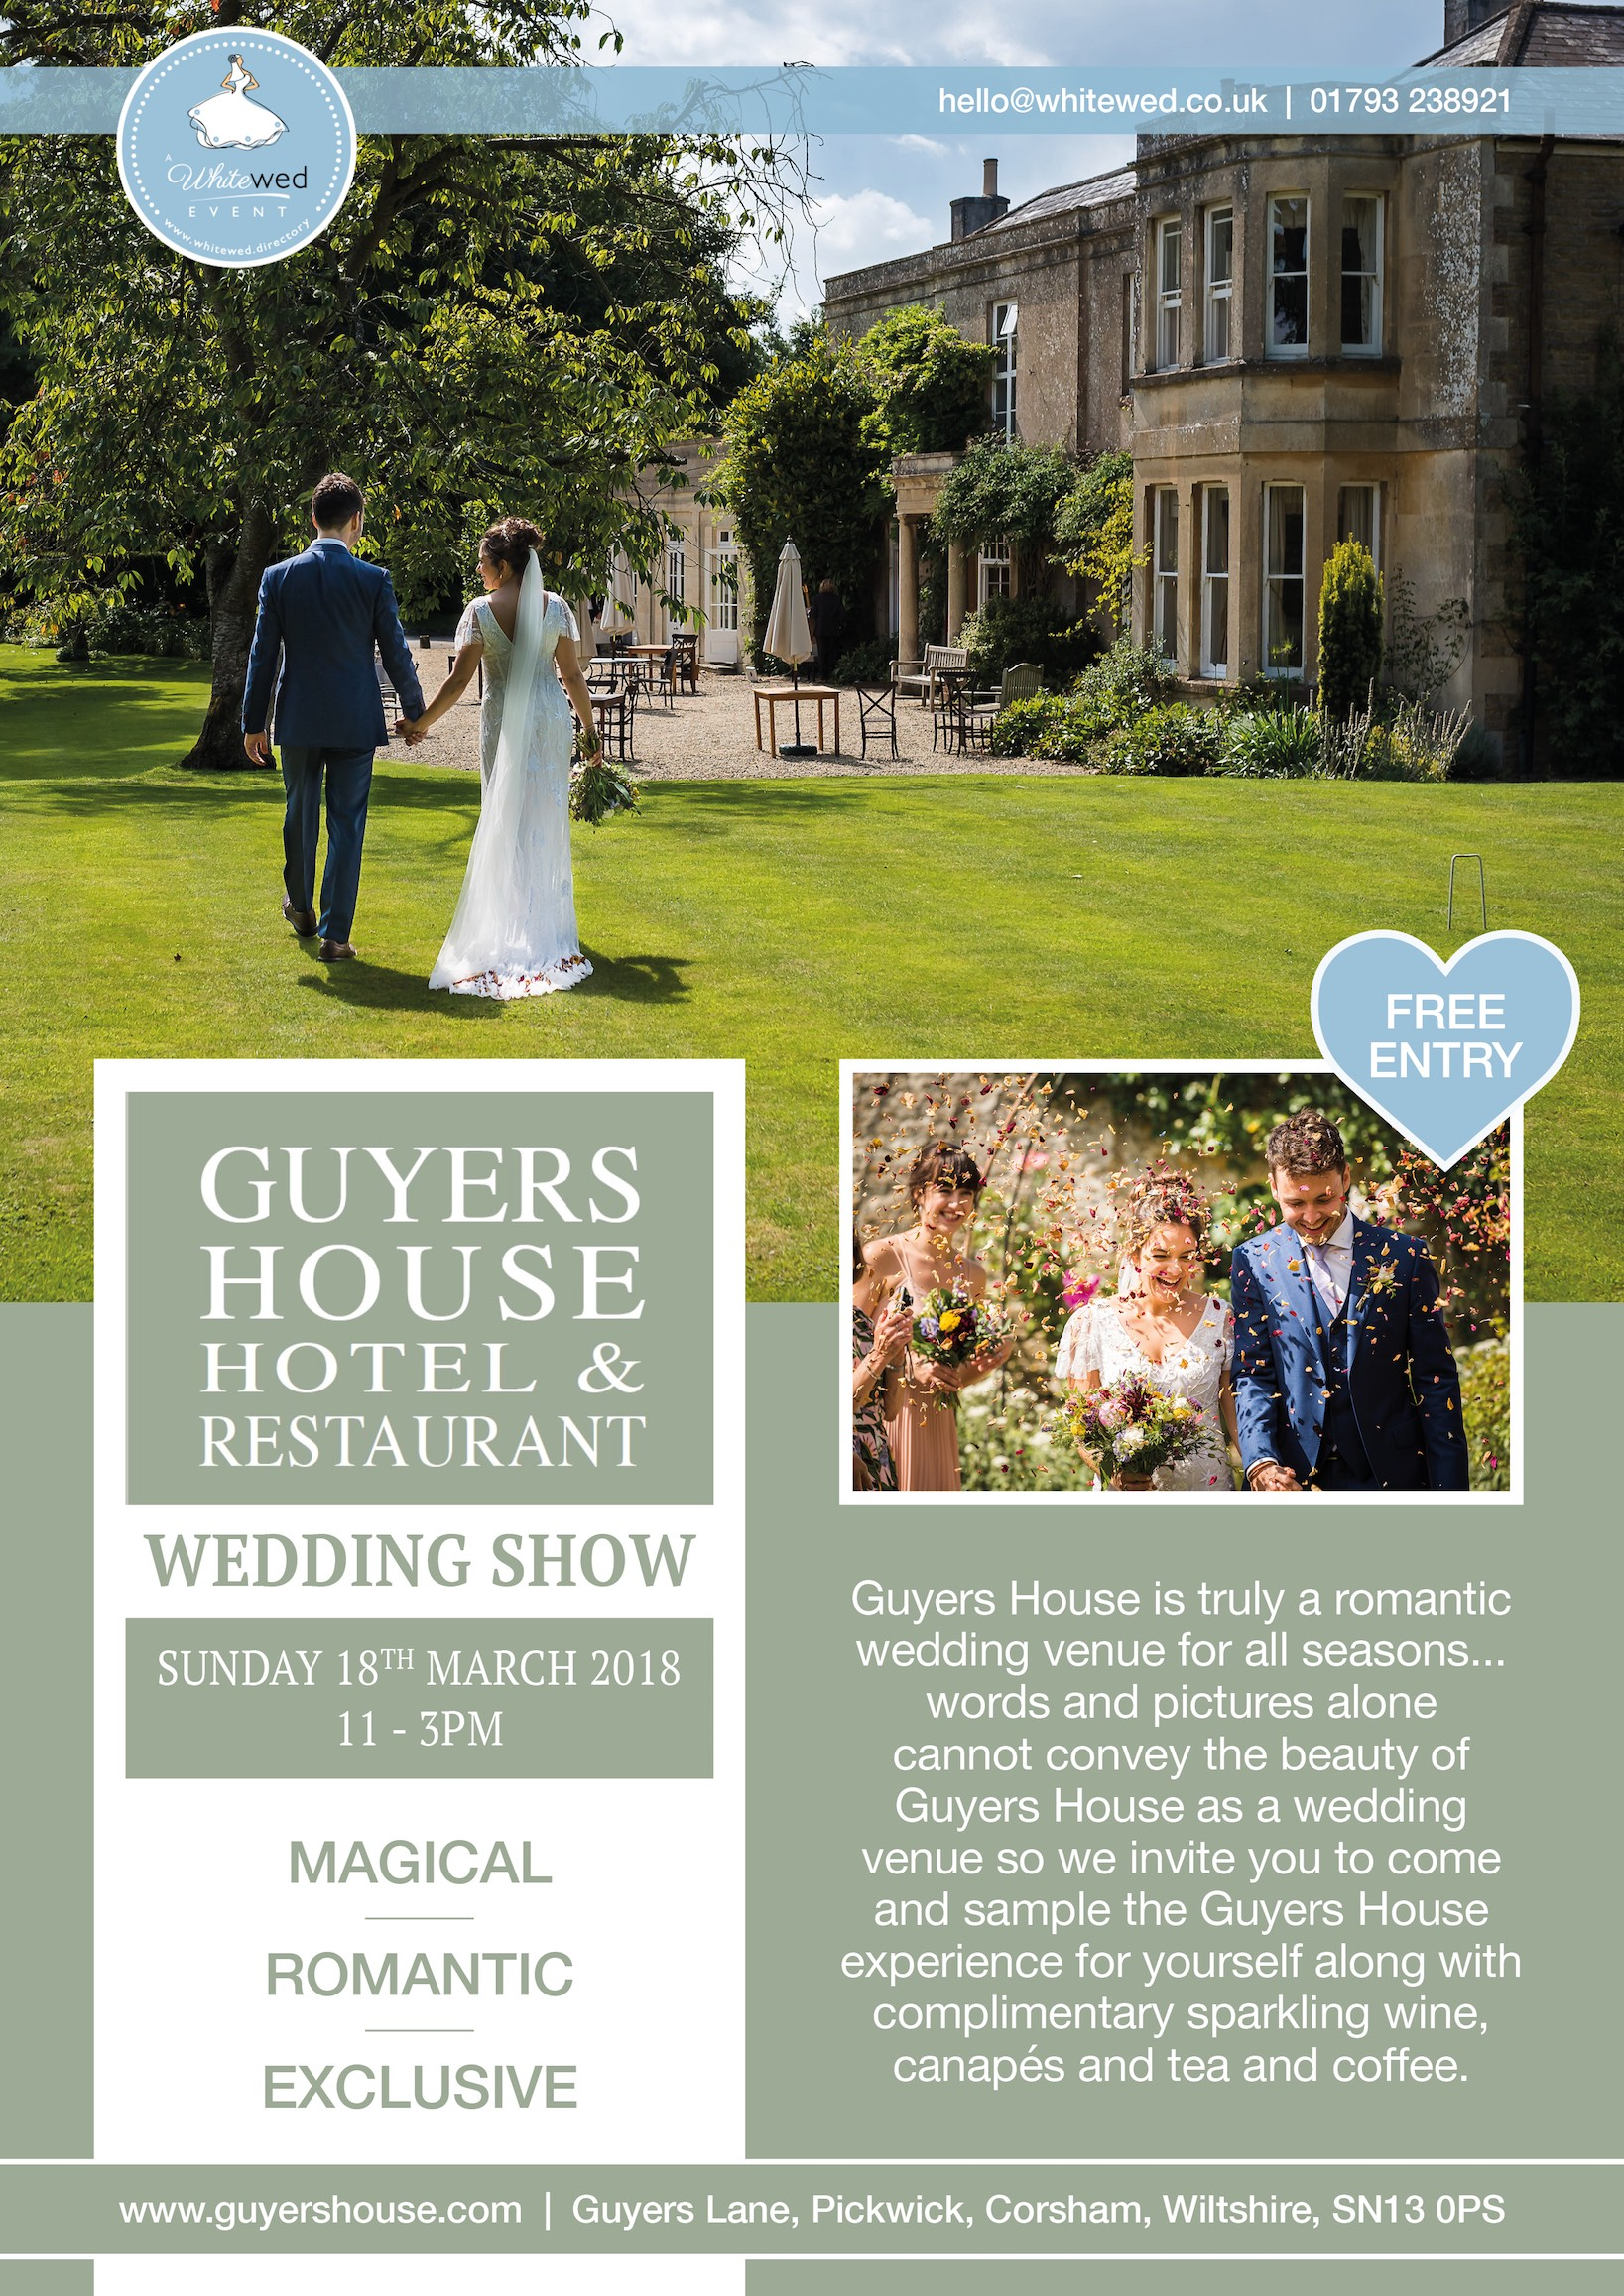 Guyers House Wedding Show Poster 18.03.18.jpg